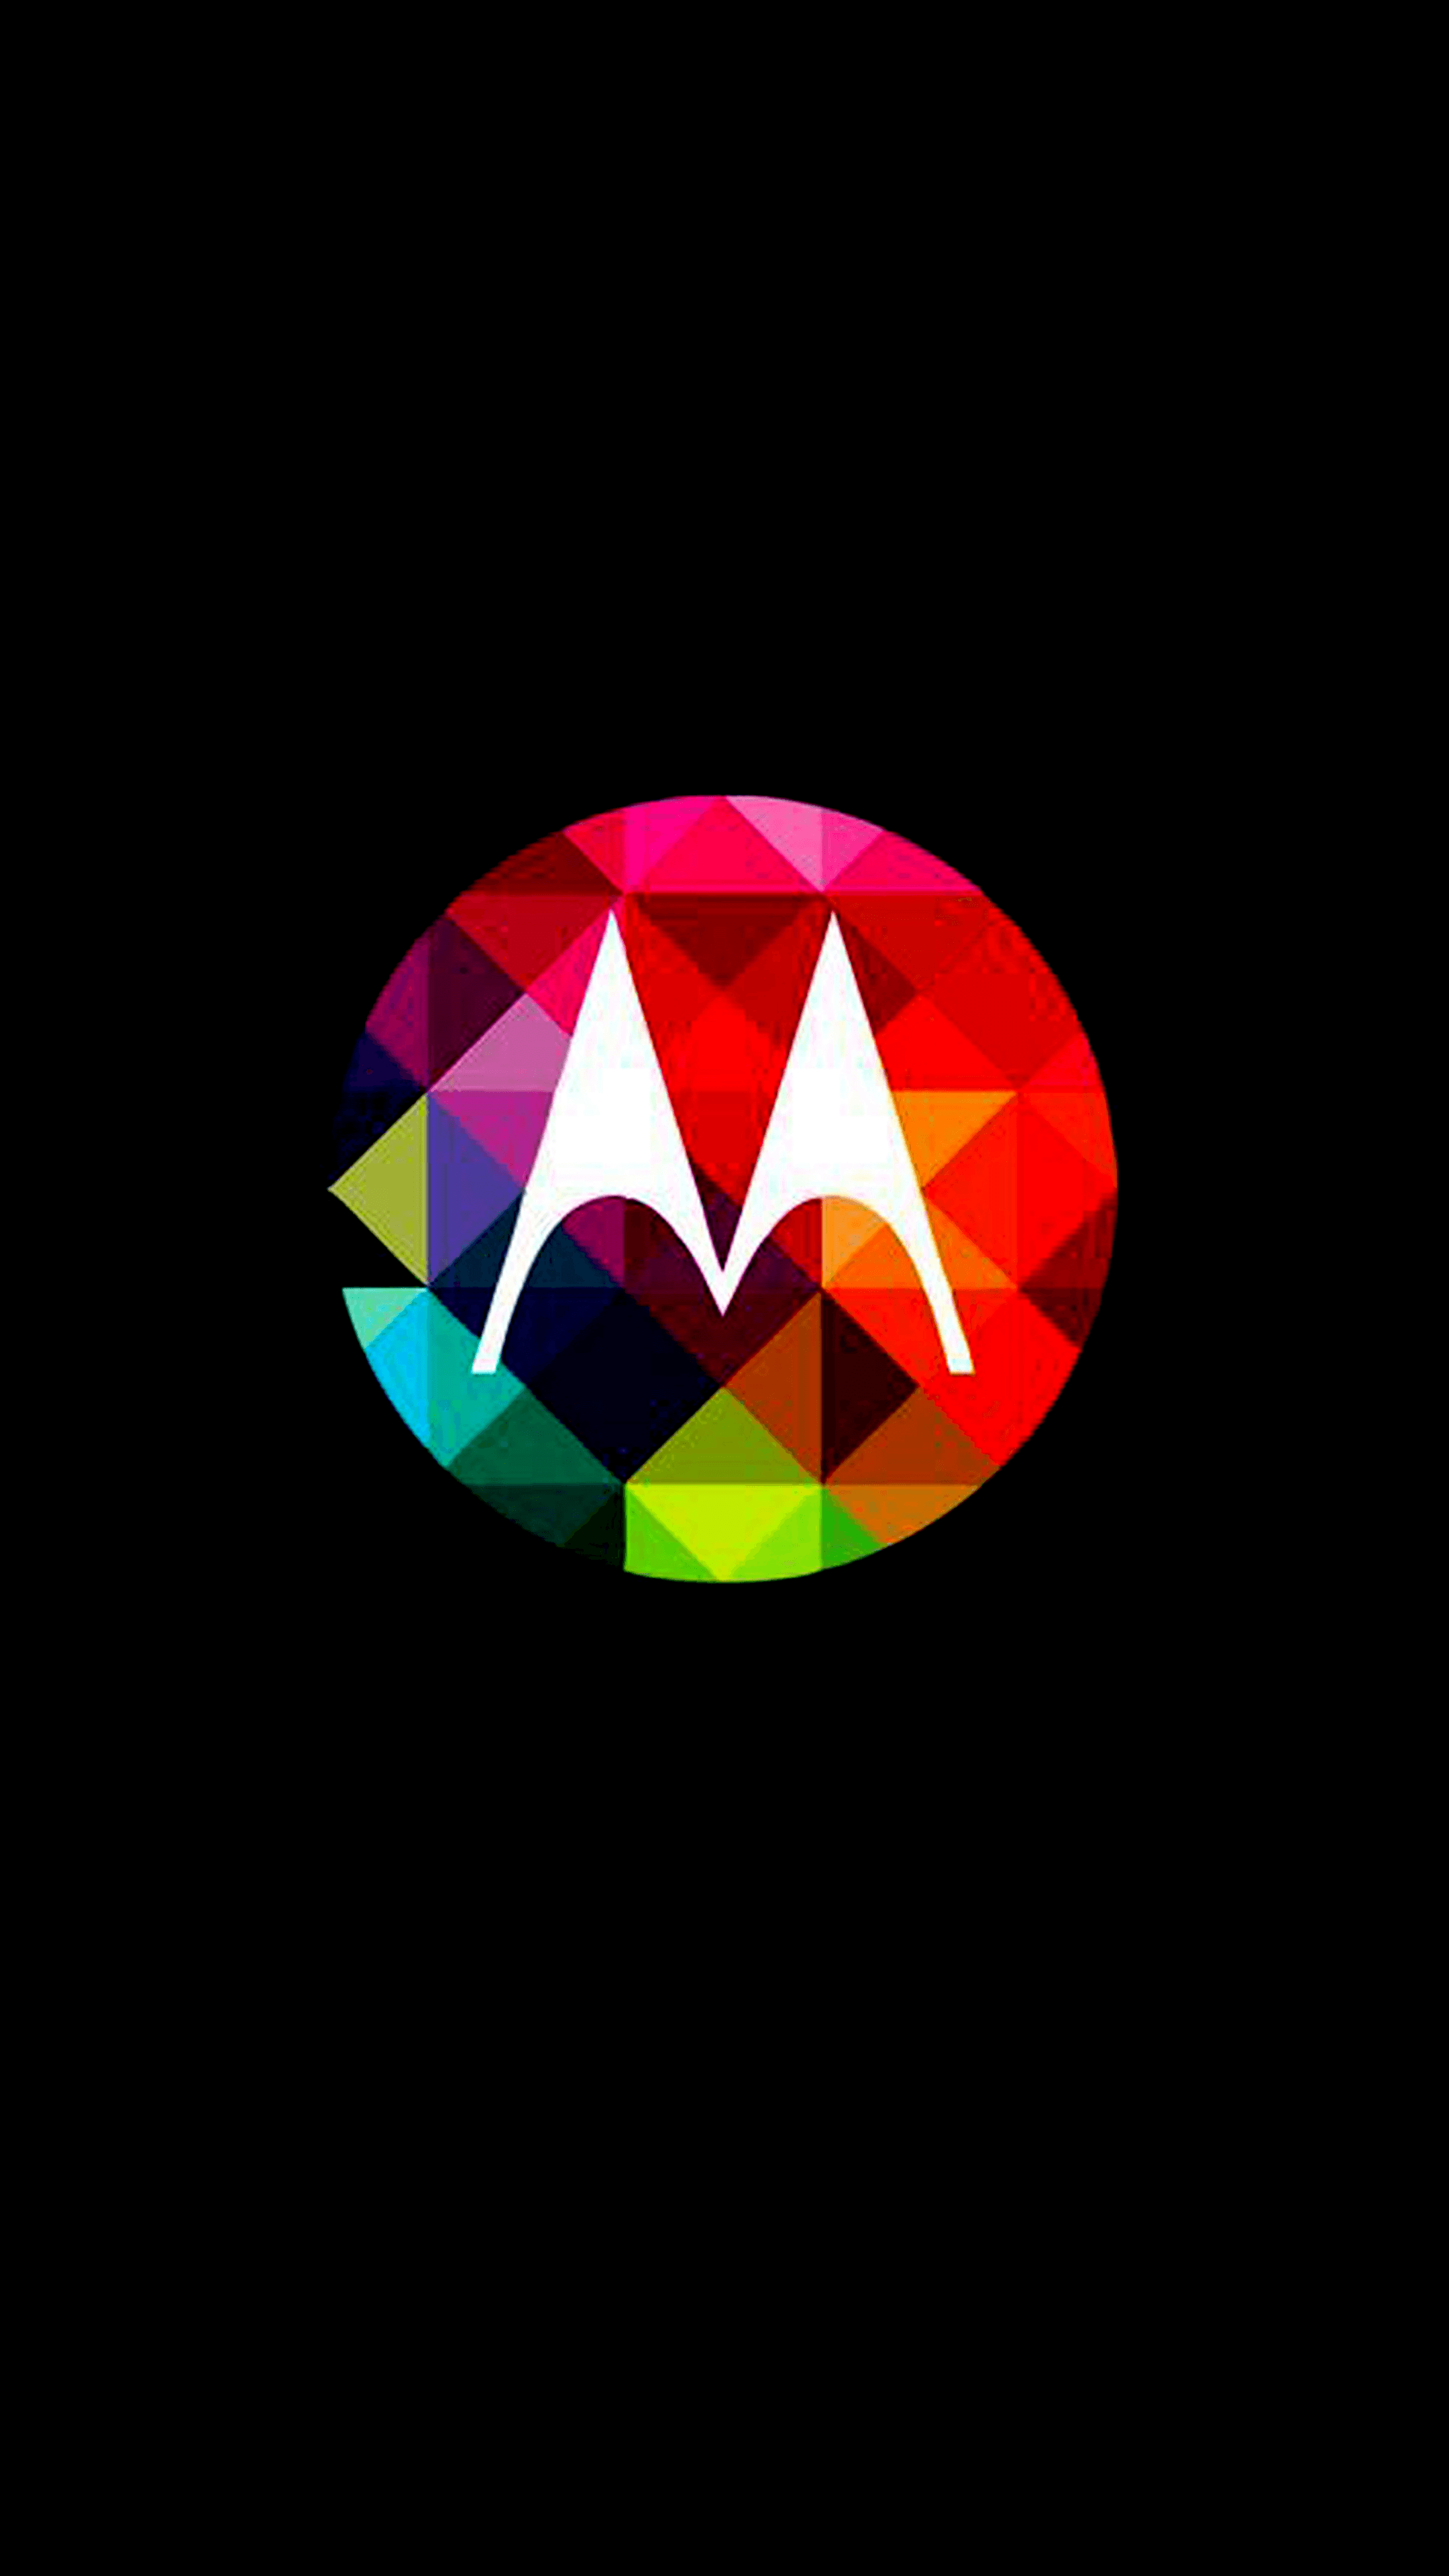 Motorola 4K AMOLED Wallpaper Amoled Wallpapers